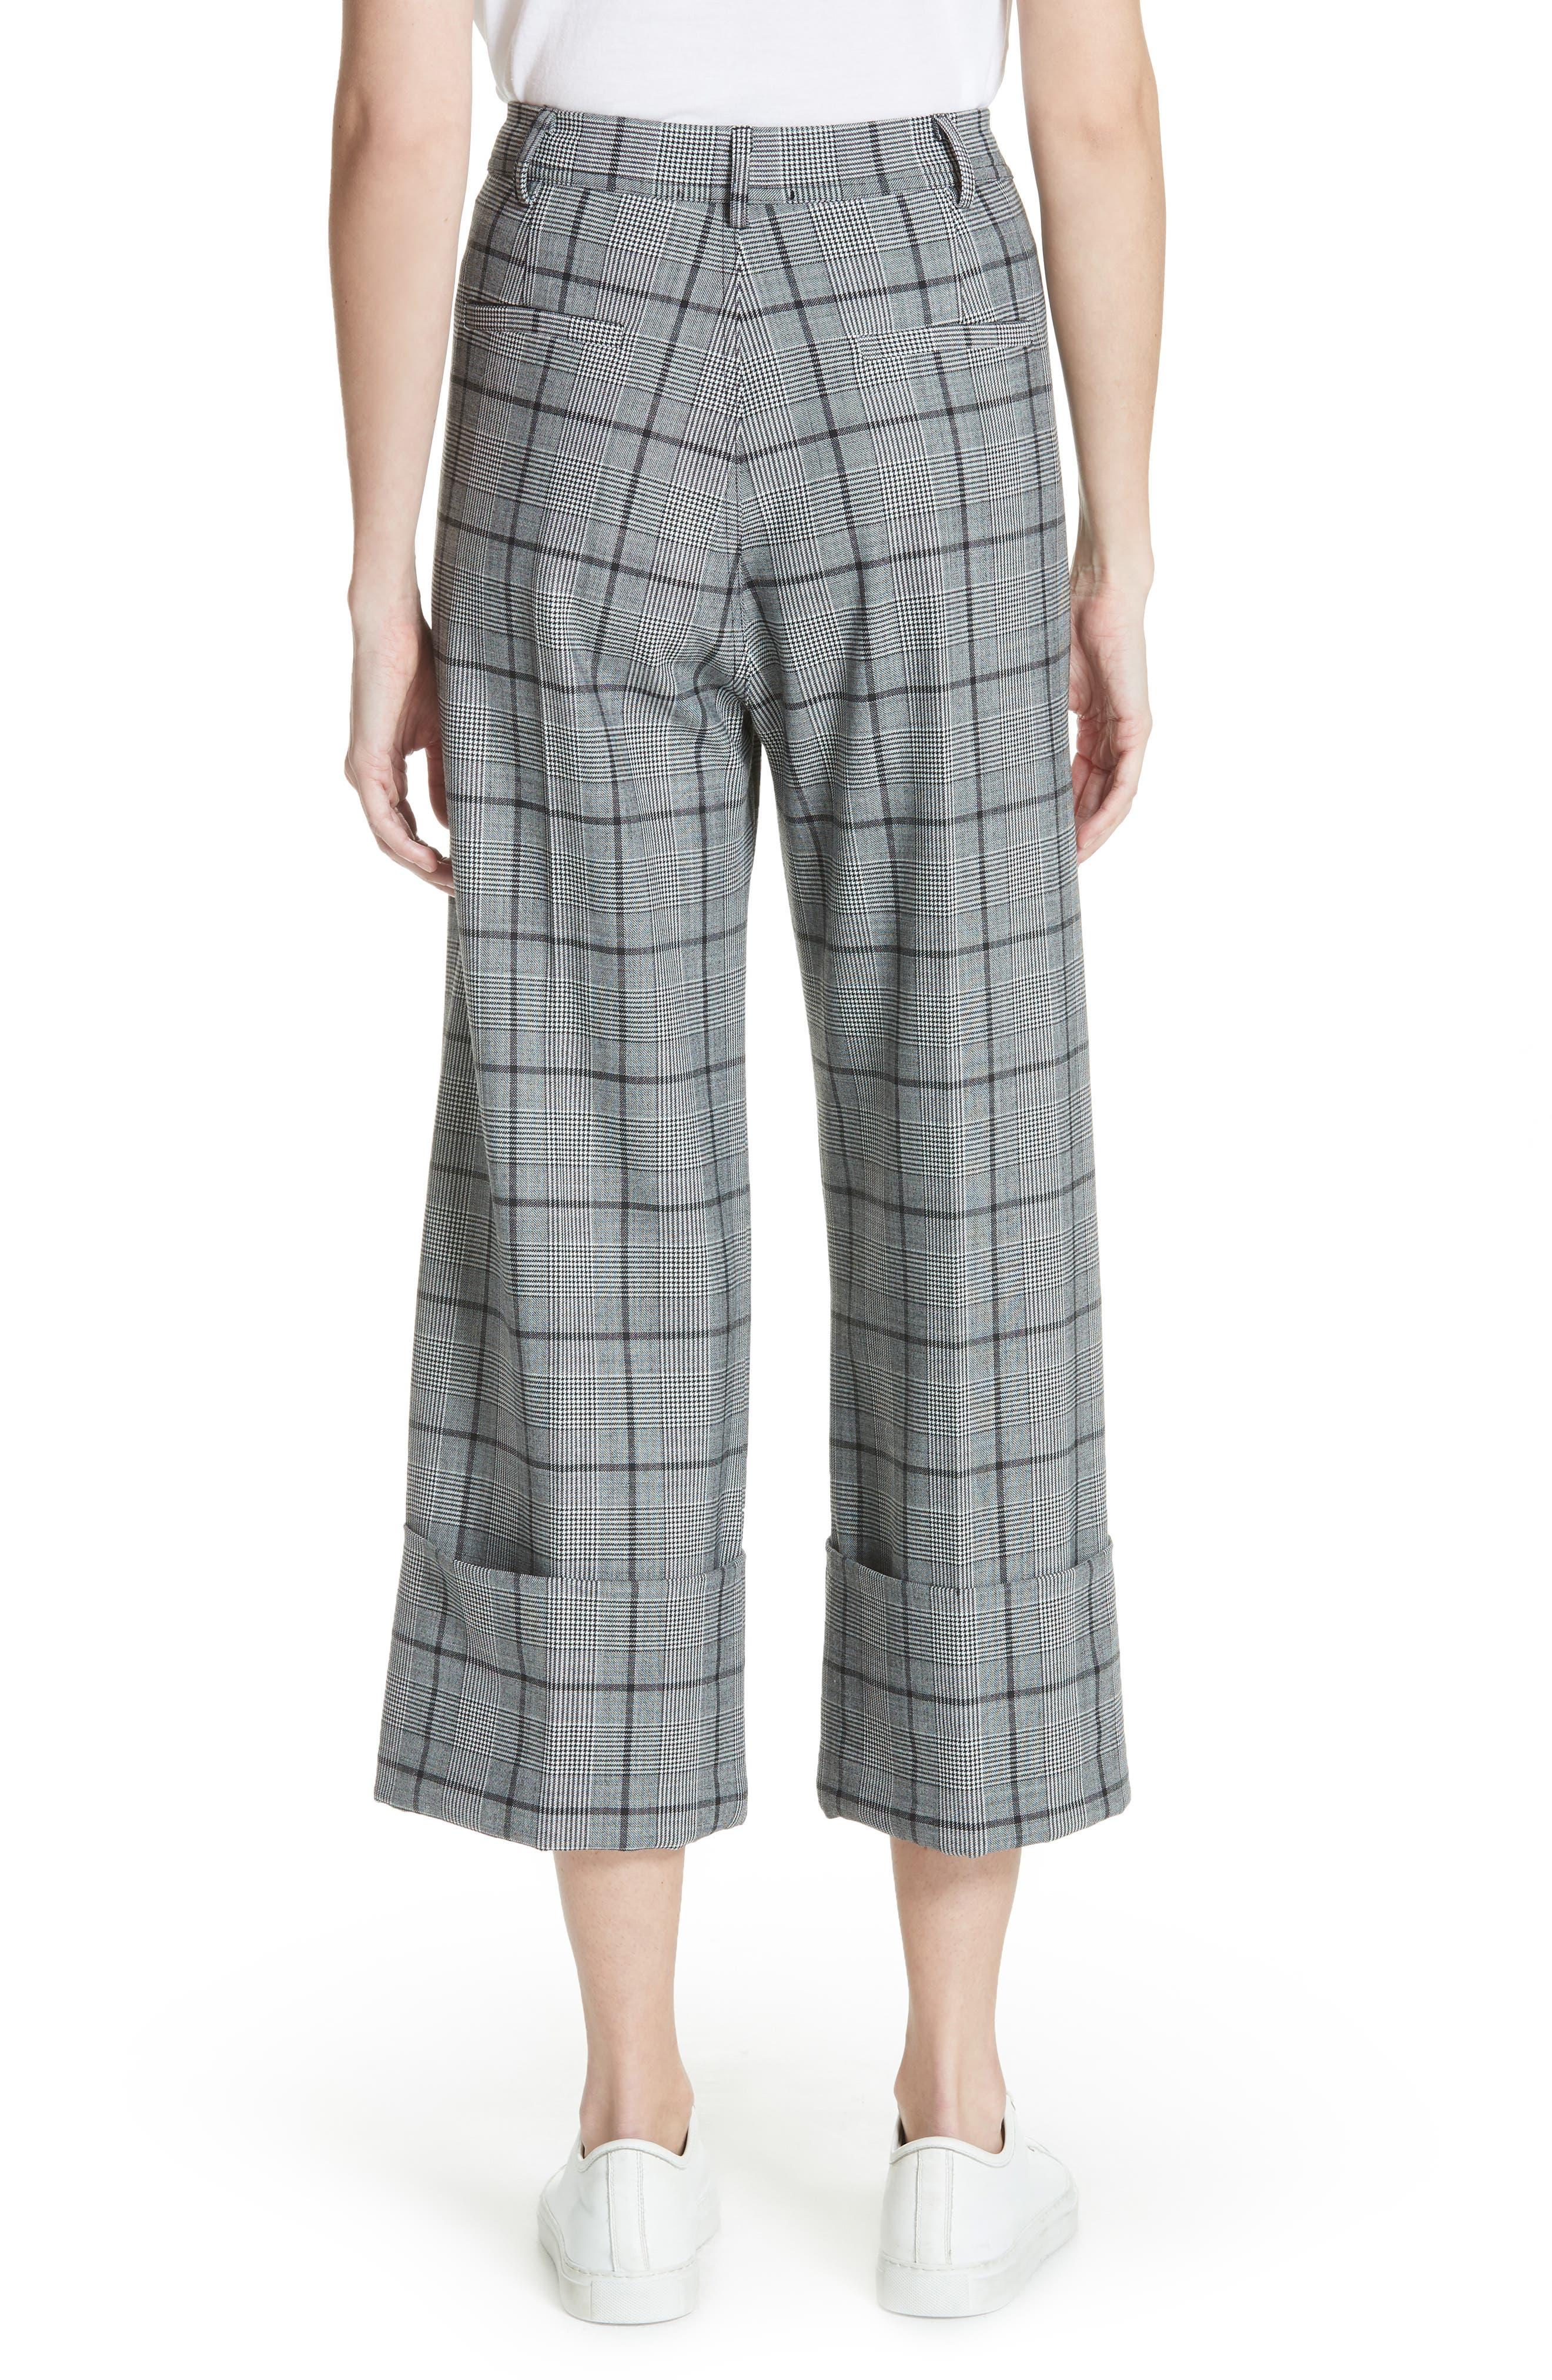 Bacall Cuff Crop Wide Leg Pants,                             Alternate thumbnail 2, color,                             028